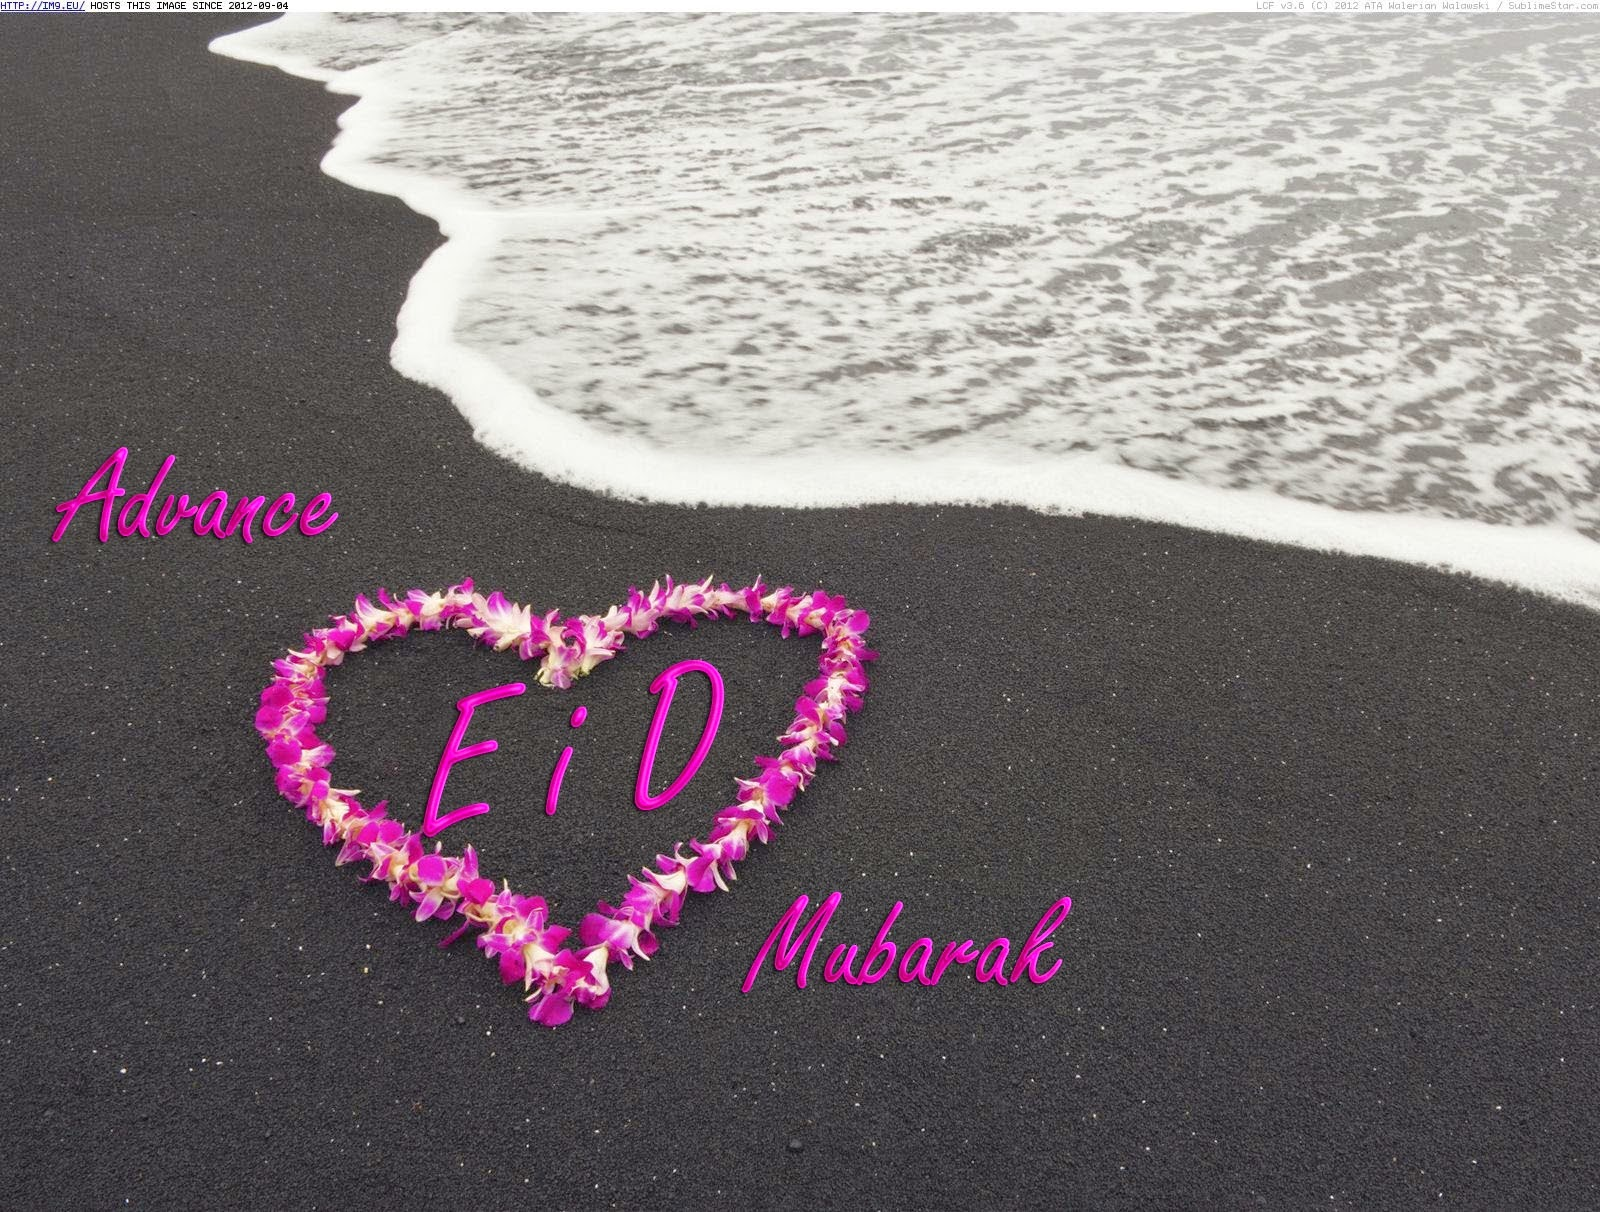 Eid Greeting Cards Advance Eid Mubarak Greetings Ecards Wallpapers